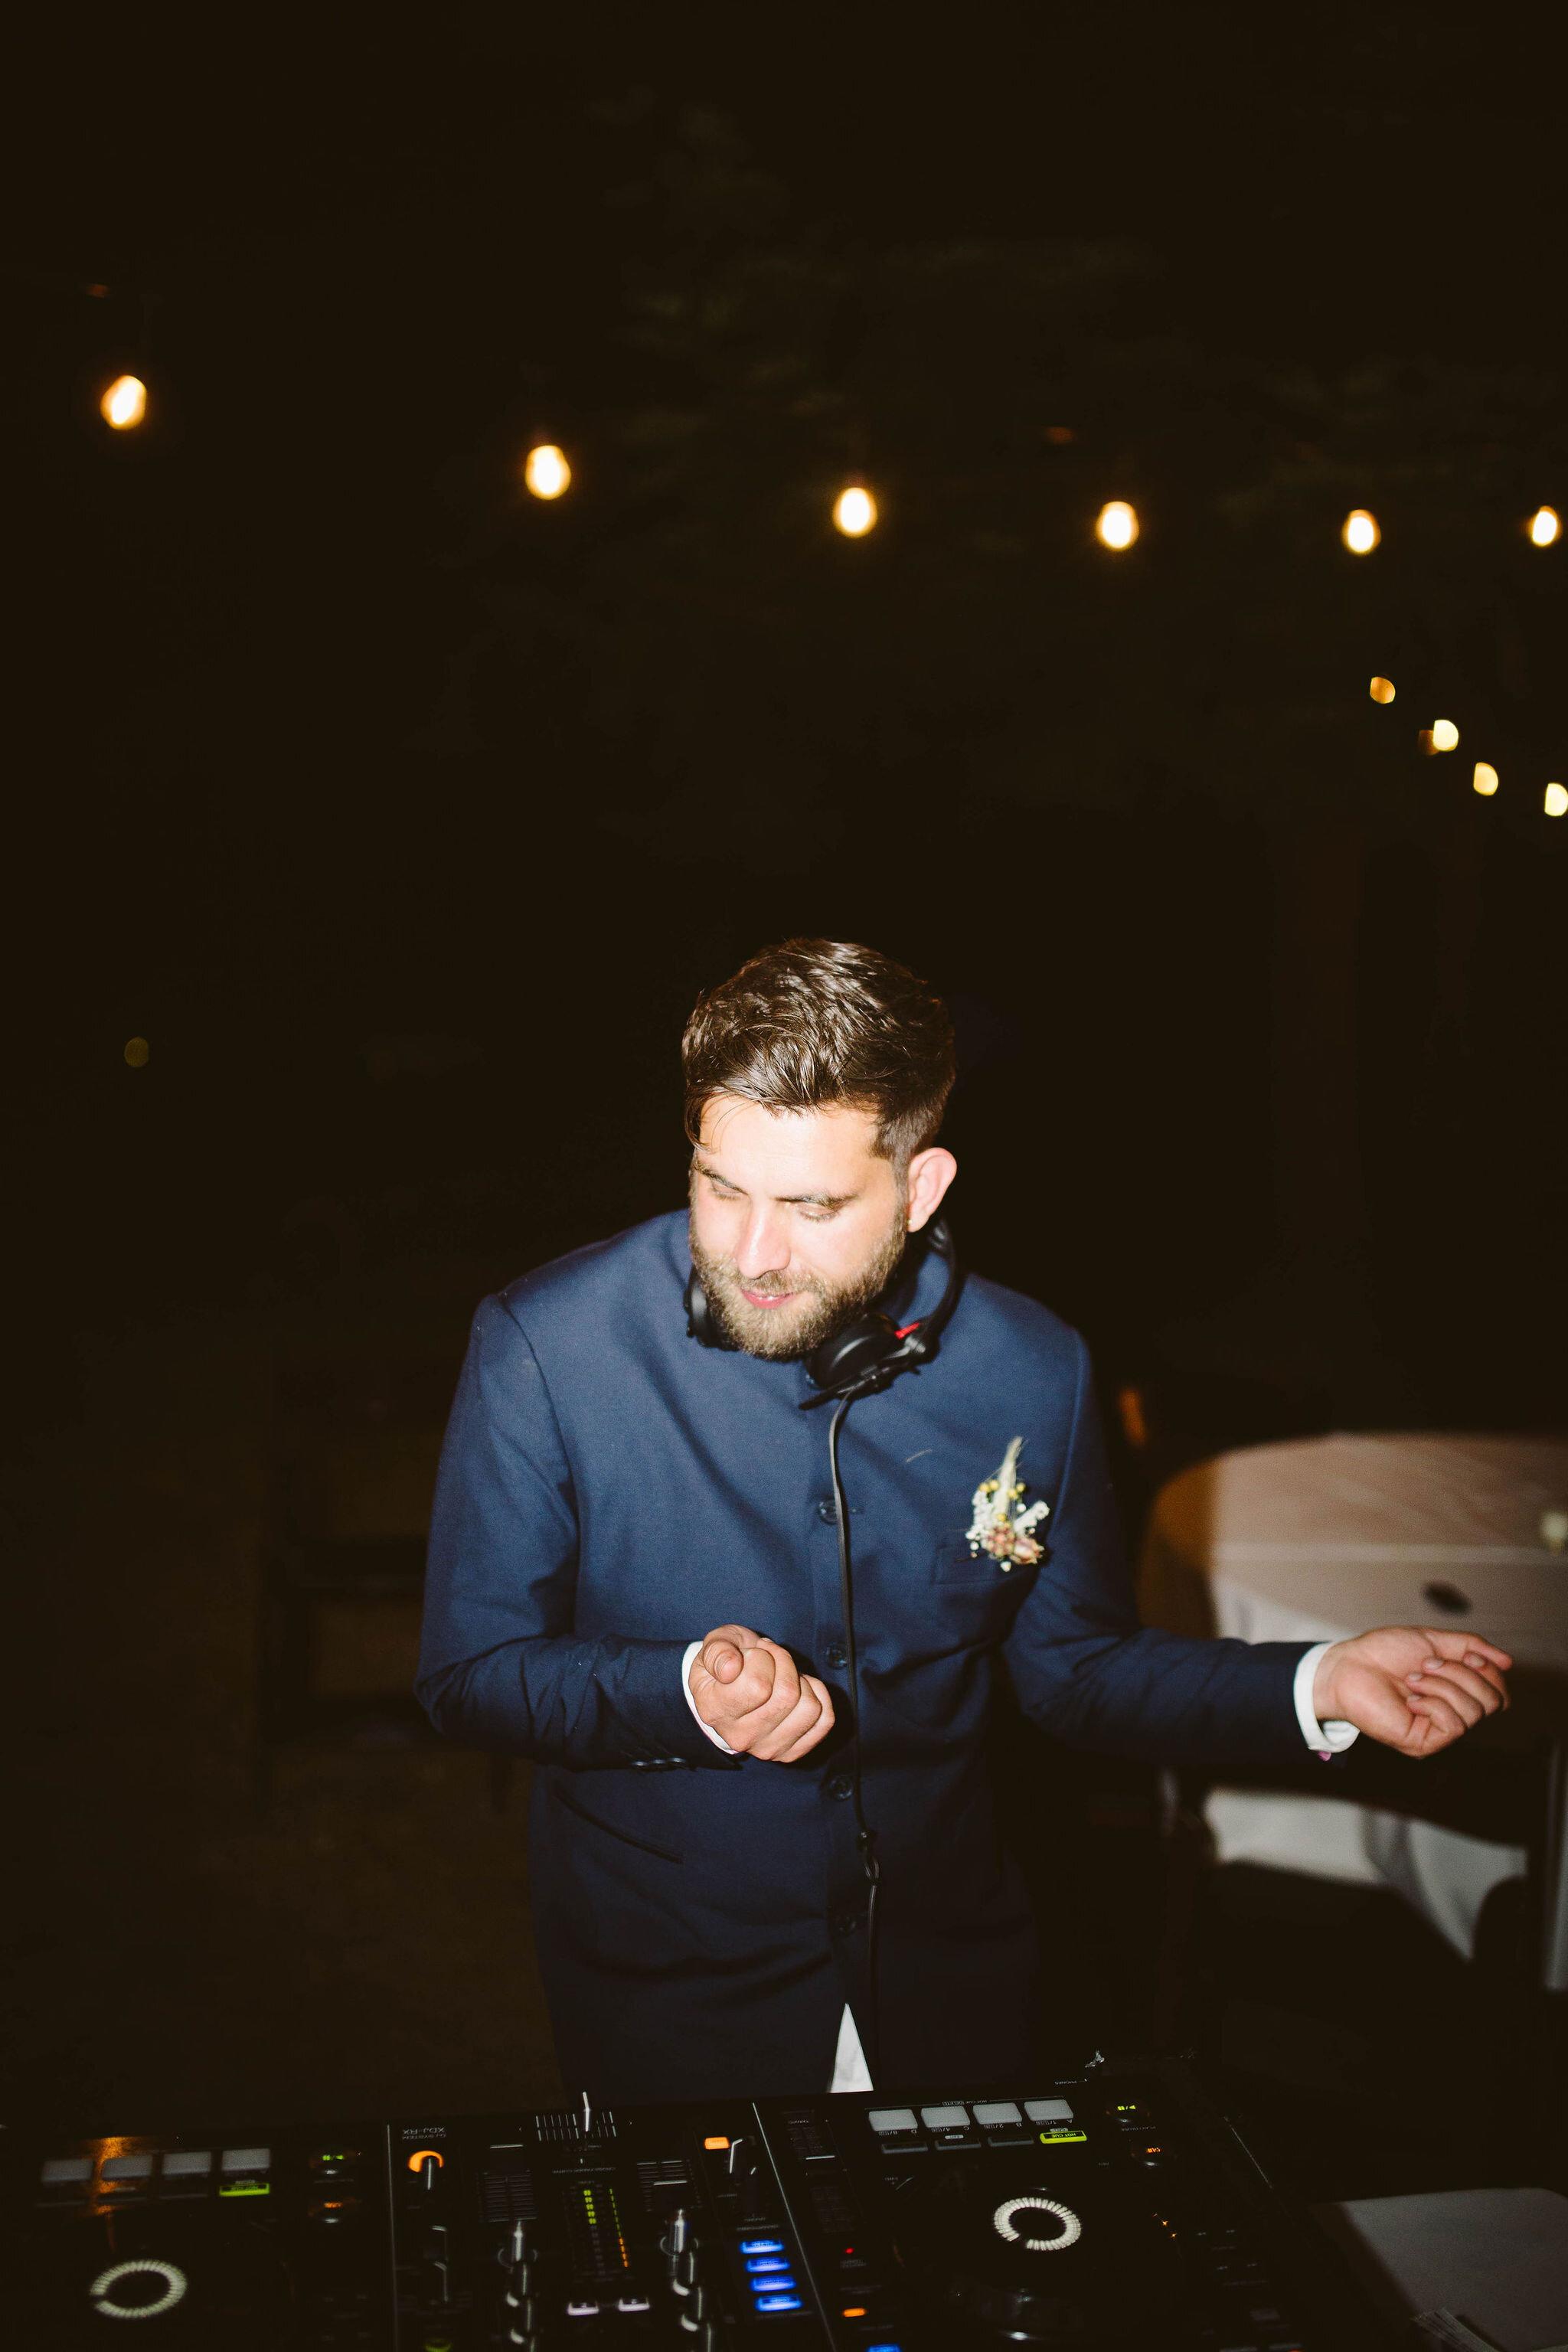 Venture-Retreat-Center-Wedding-Pescadero-Sat-Aaron-Pritam-The-Shalom-Imaginative-853.jpg